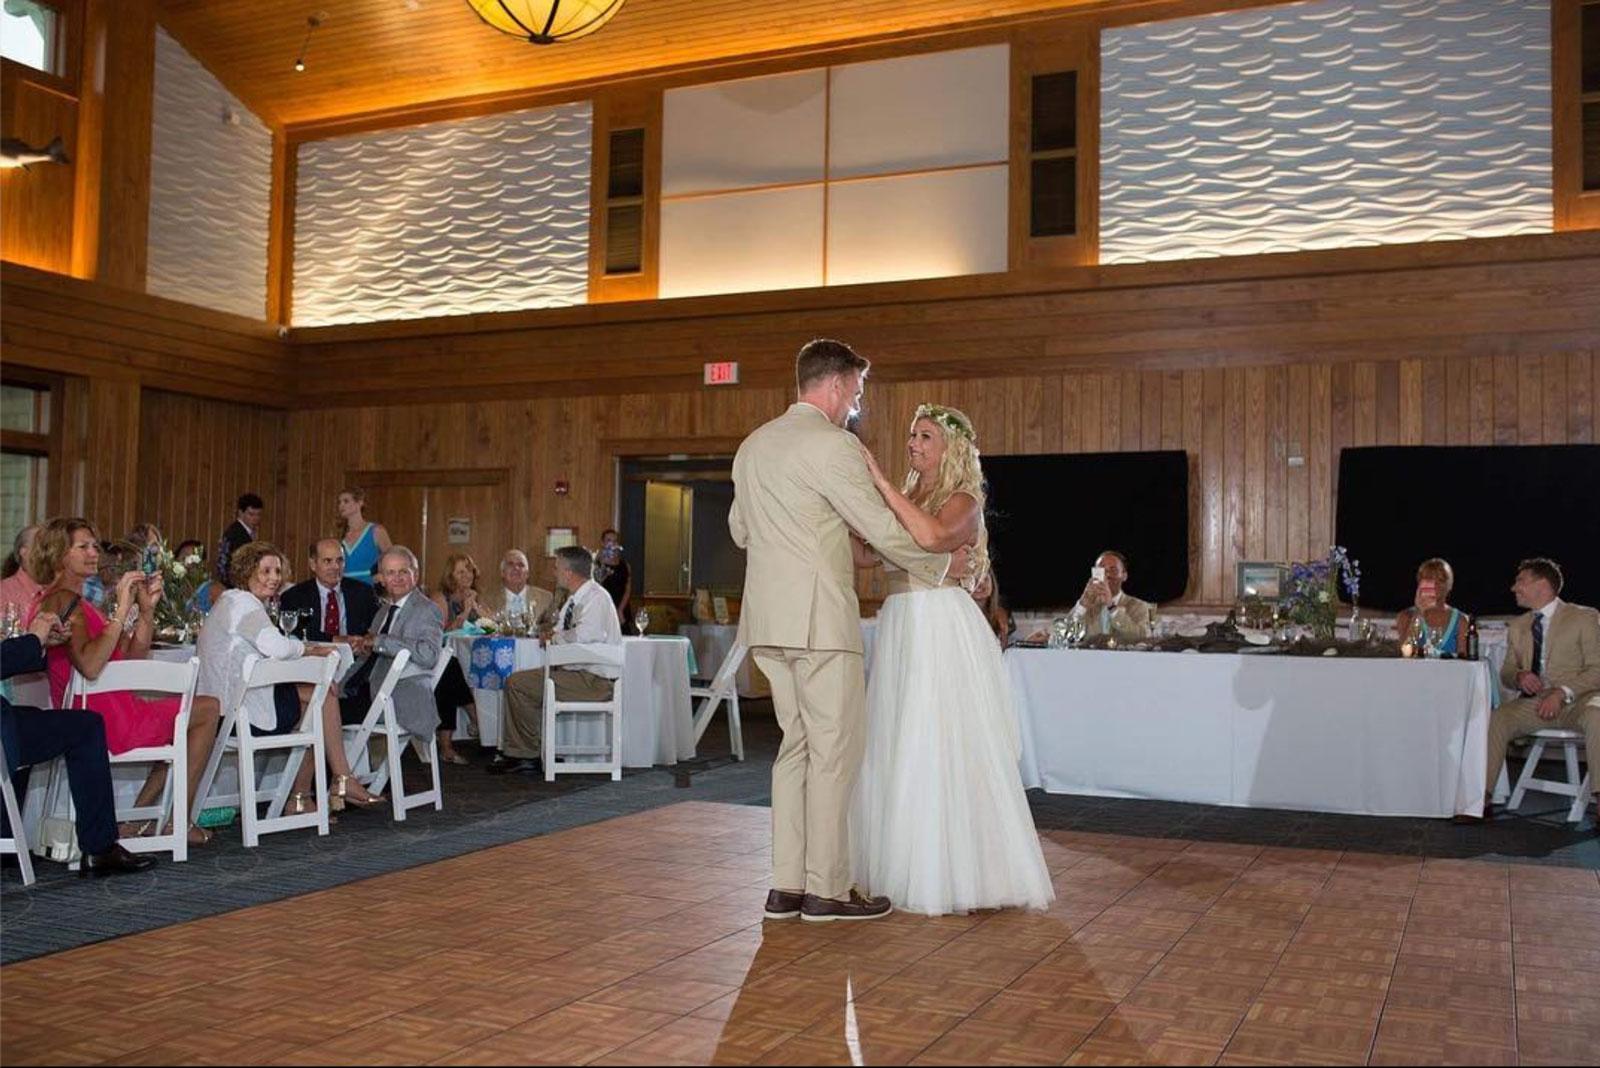 Oak style portable wedding dance floor inside a building